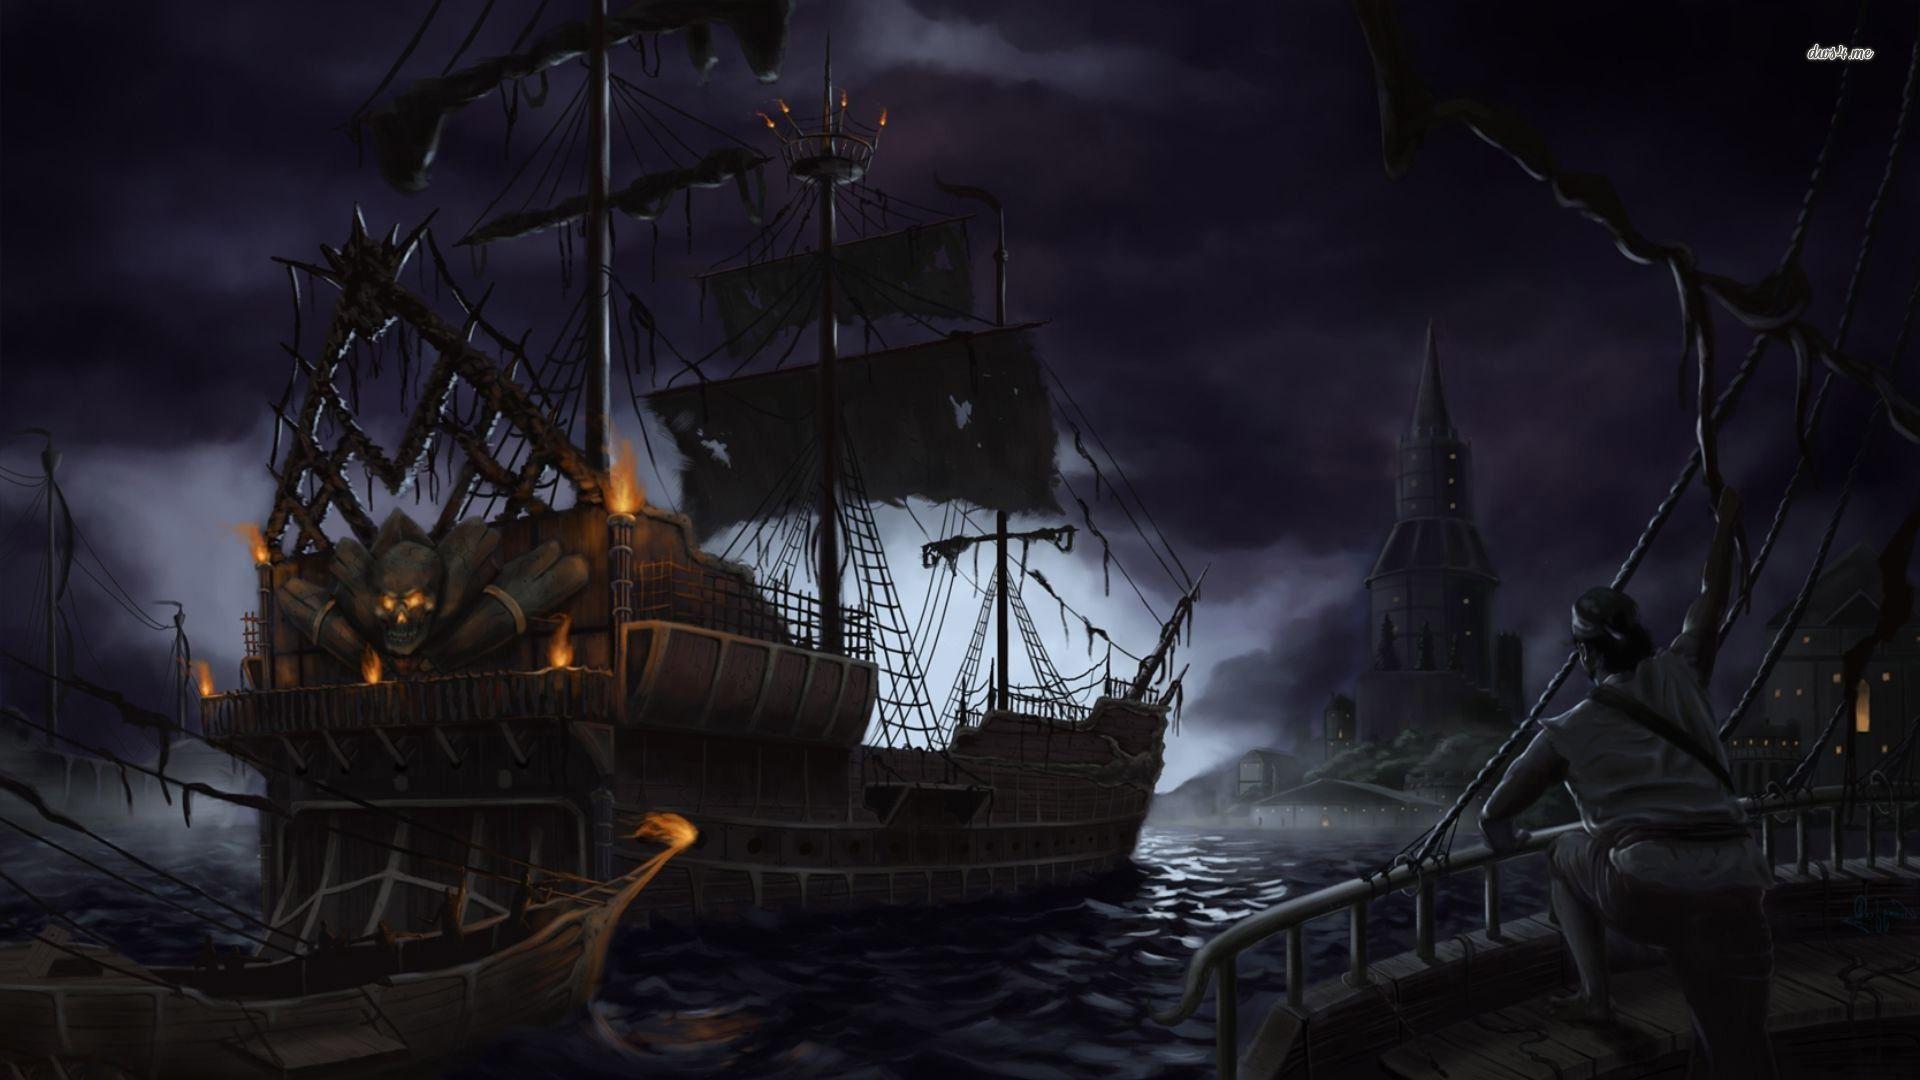 Fantasy ship cliff jolly roger pirate ship rock lightning wallpaper - Pirate Ship In Attack